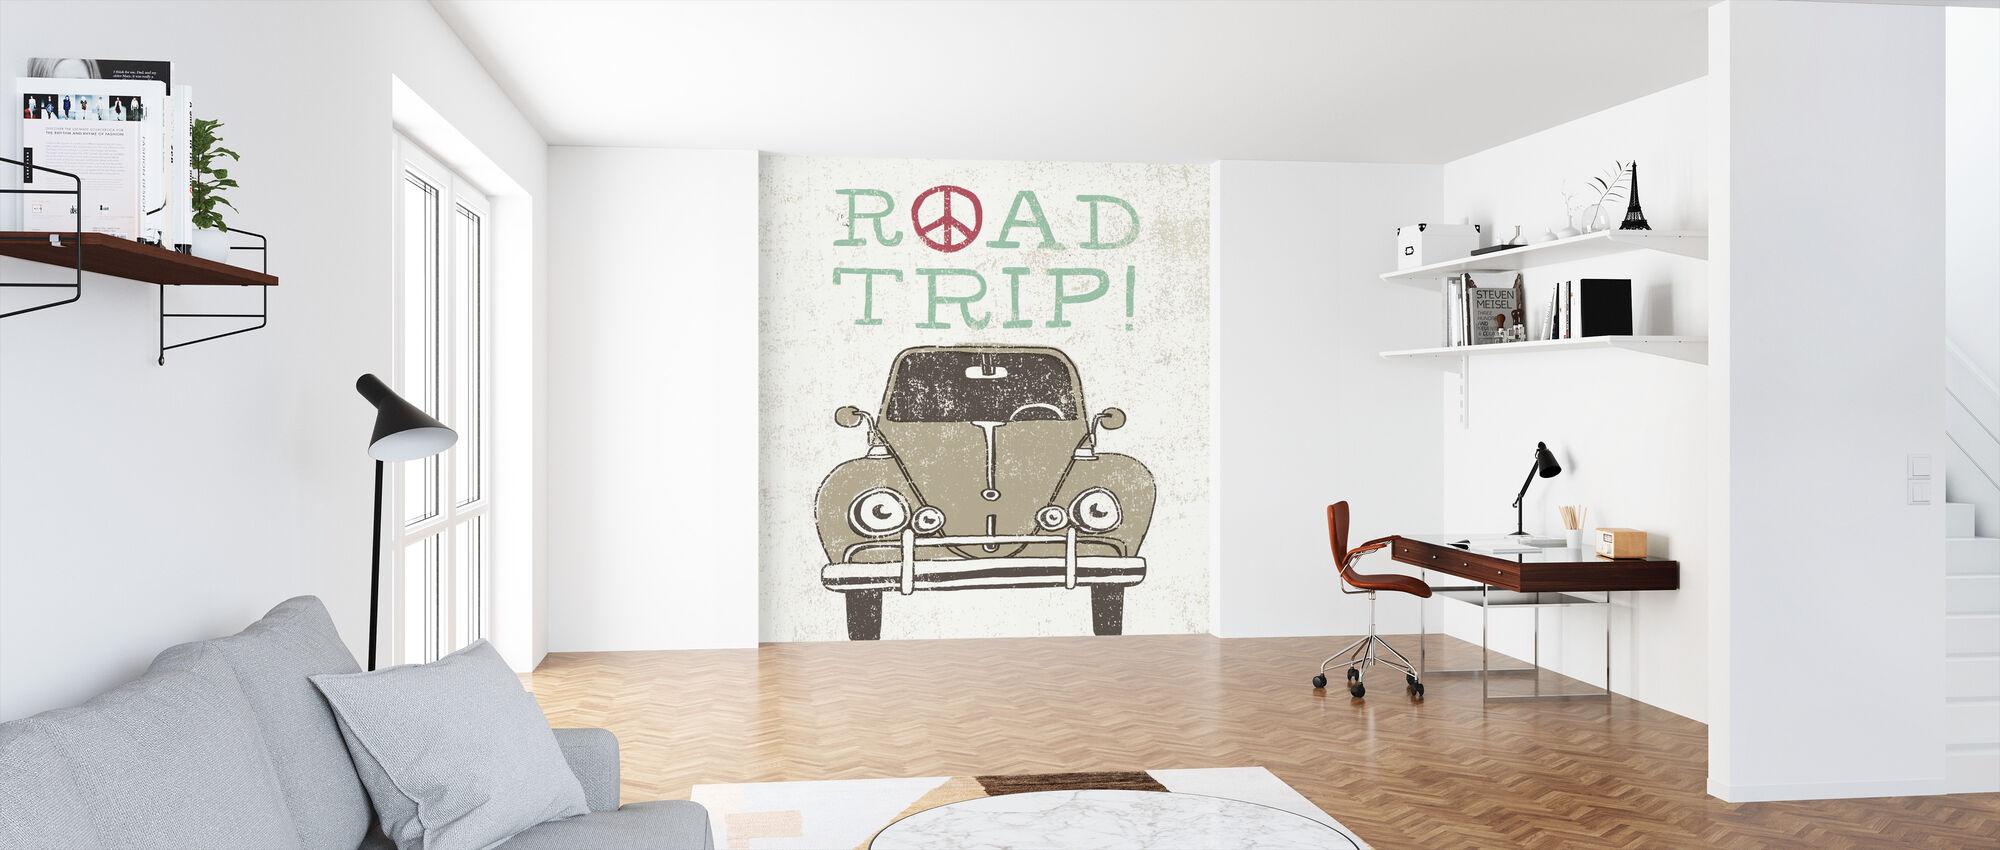 Road Trip - Beetle - Wallpaper - Office